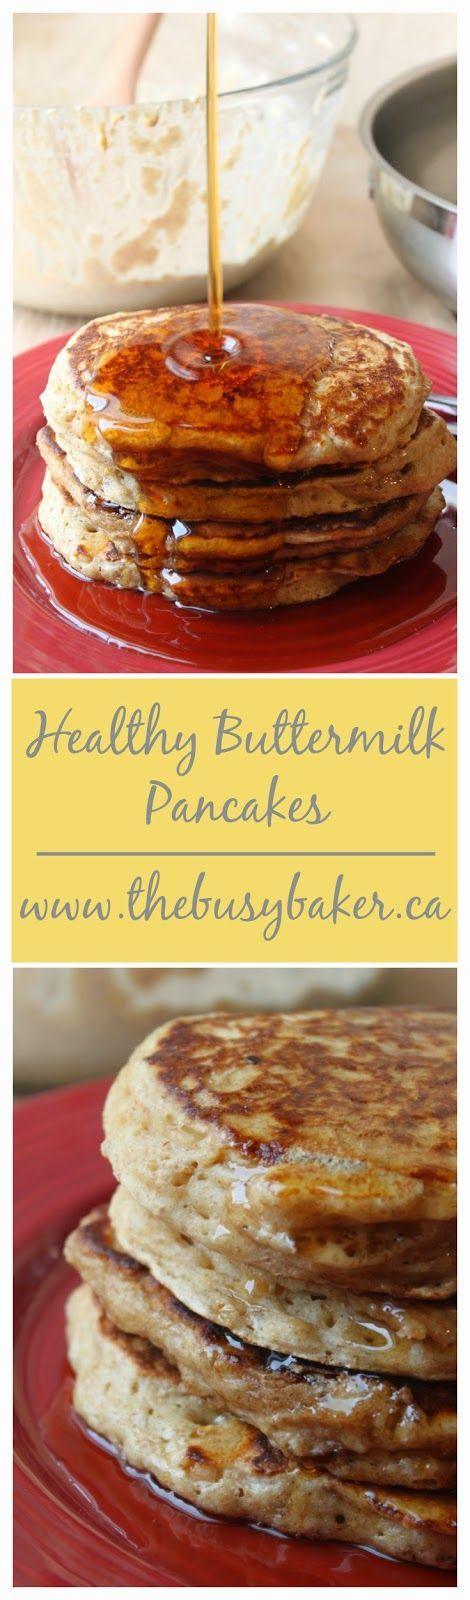 Healthy Buttermilk Pancakes Healthy Pancake Recipe Buttermilk Pancakes Pancakes Pancakes Waffles